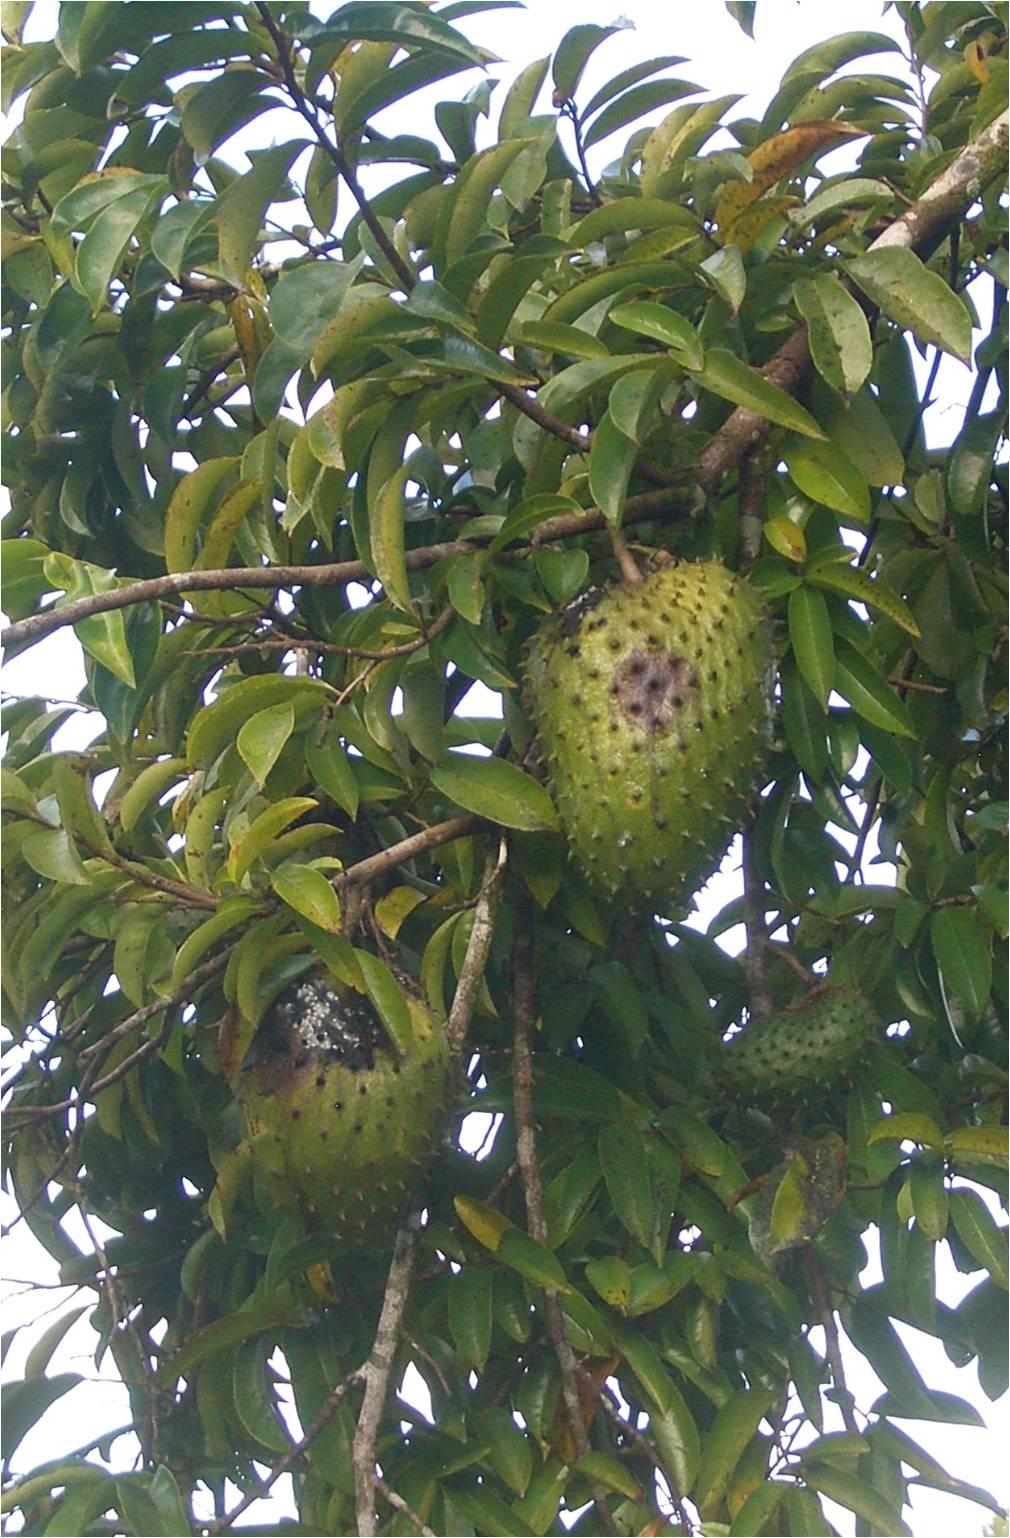 Daleys Fruit Tree Blog: Soursop Tree for Sale in Australia  |Guyabano Tree